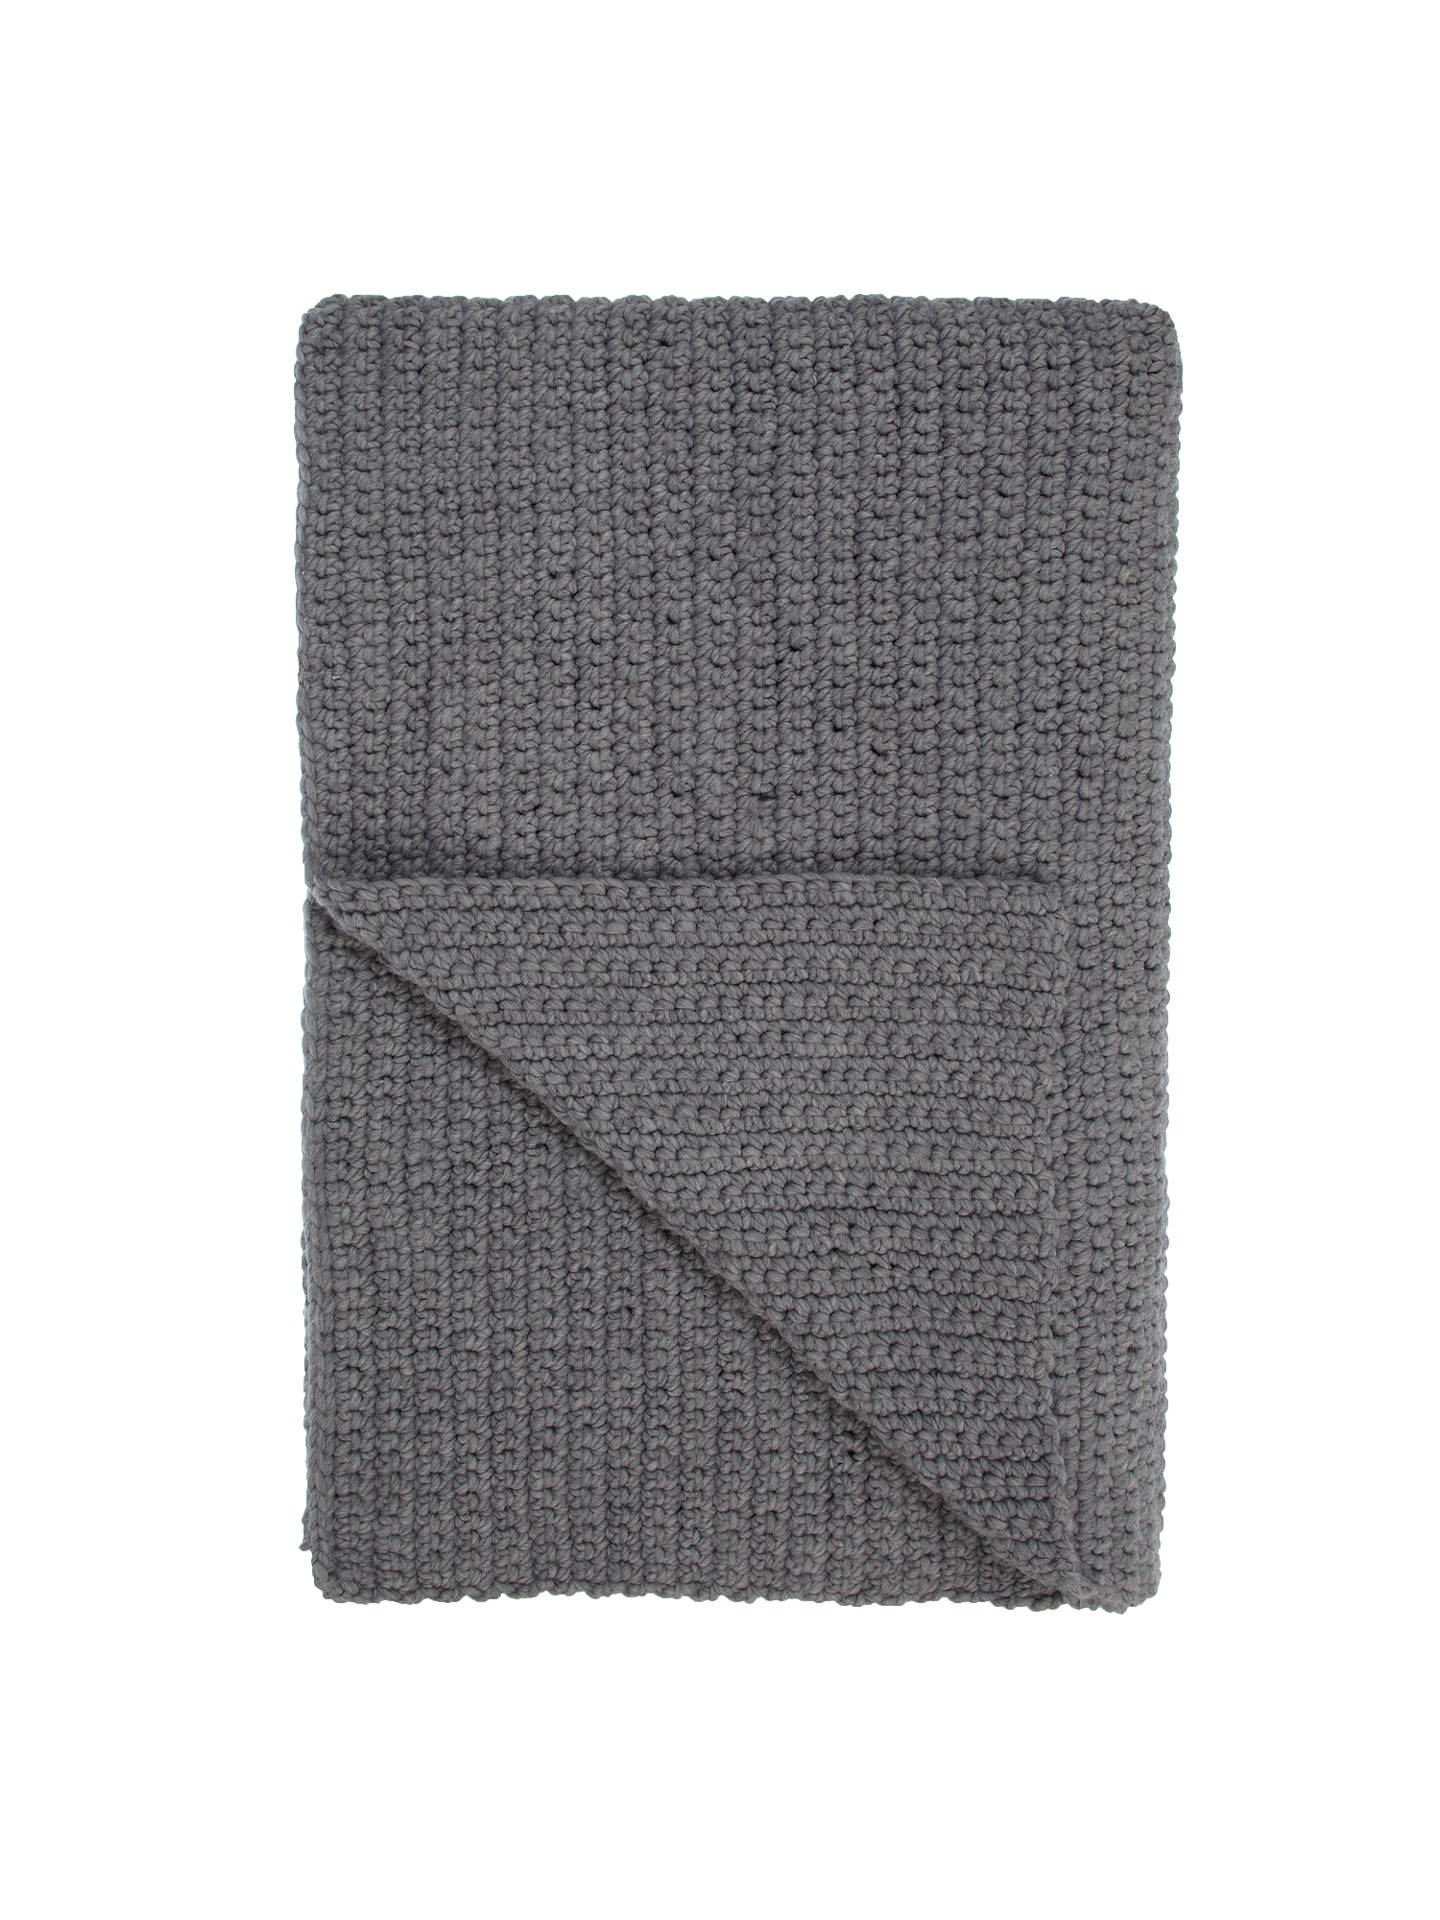 john lewis croft collection ribbed knit throw at john. Black Bedroom Furniture Sets. Home Design Ideas